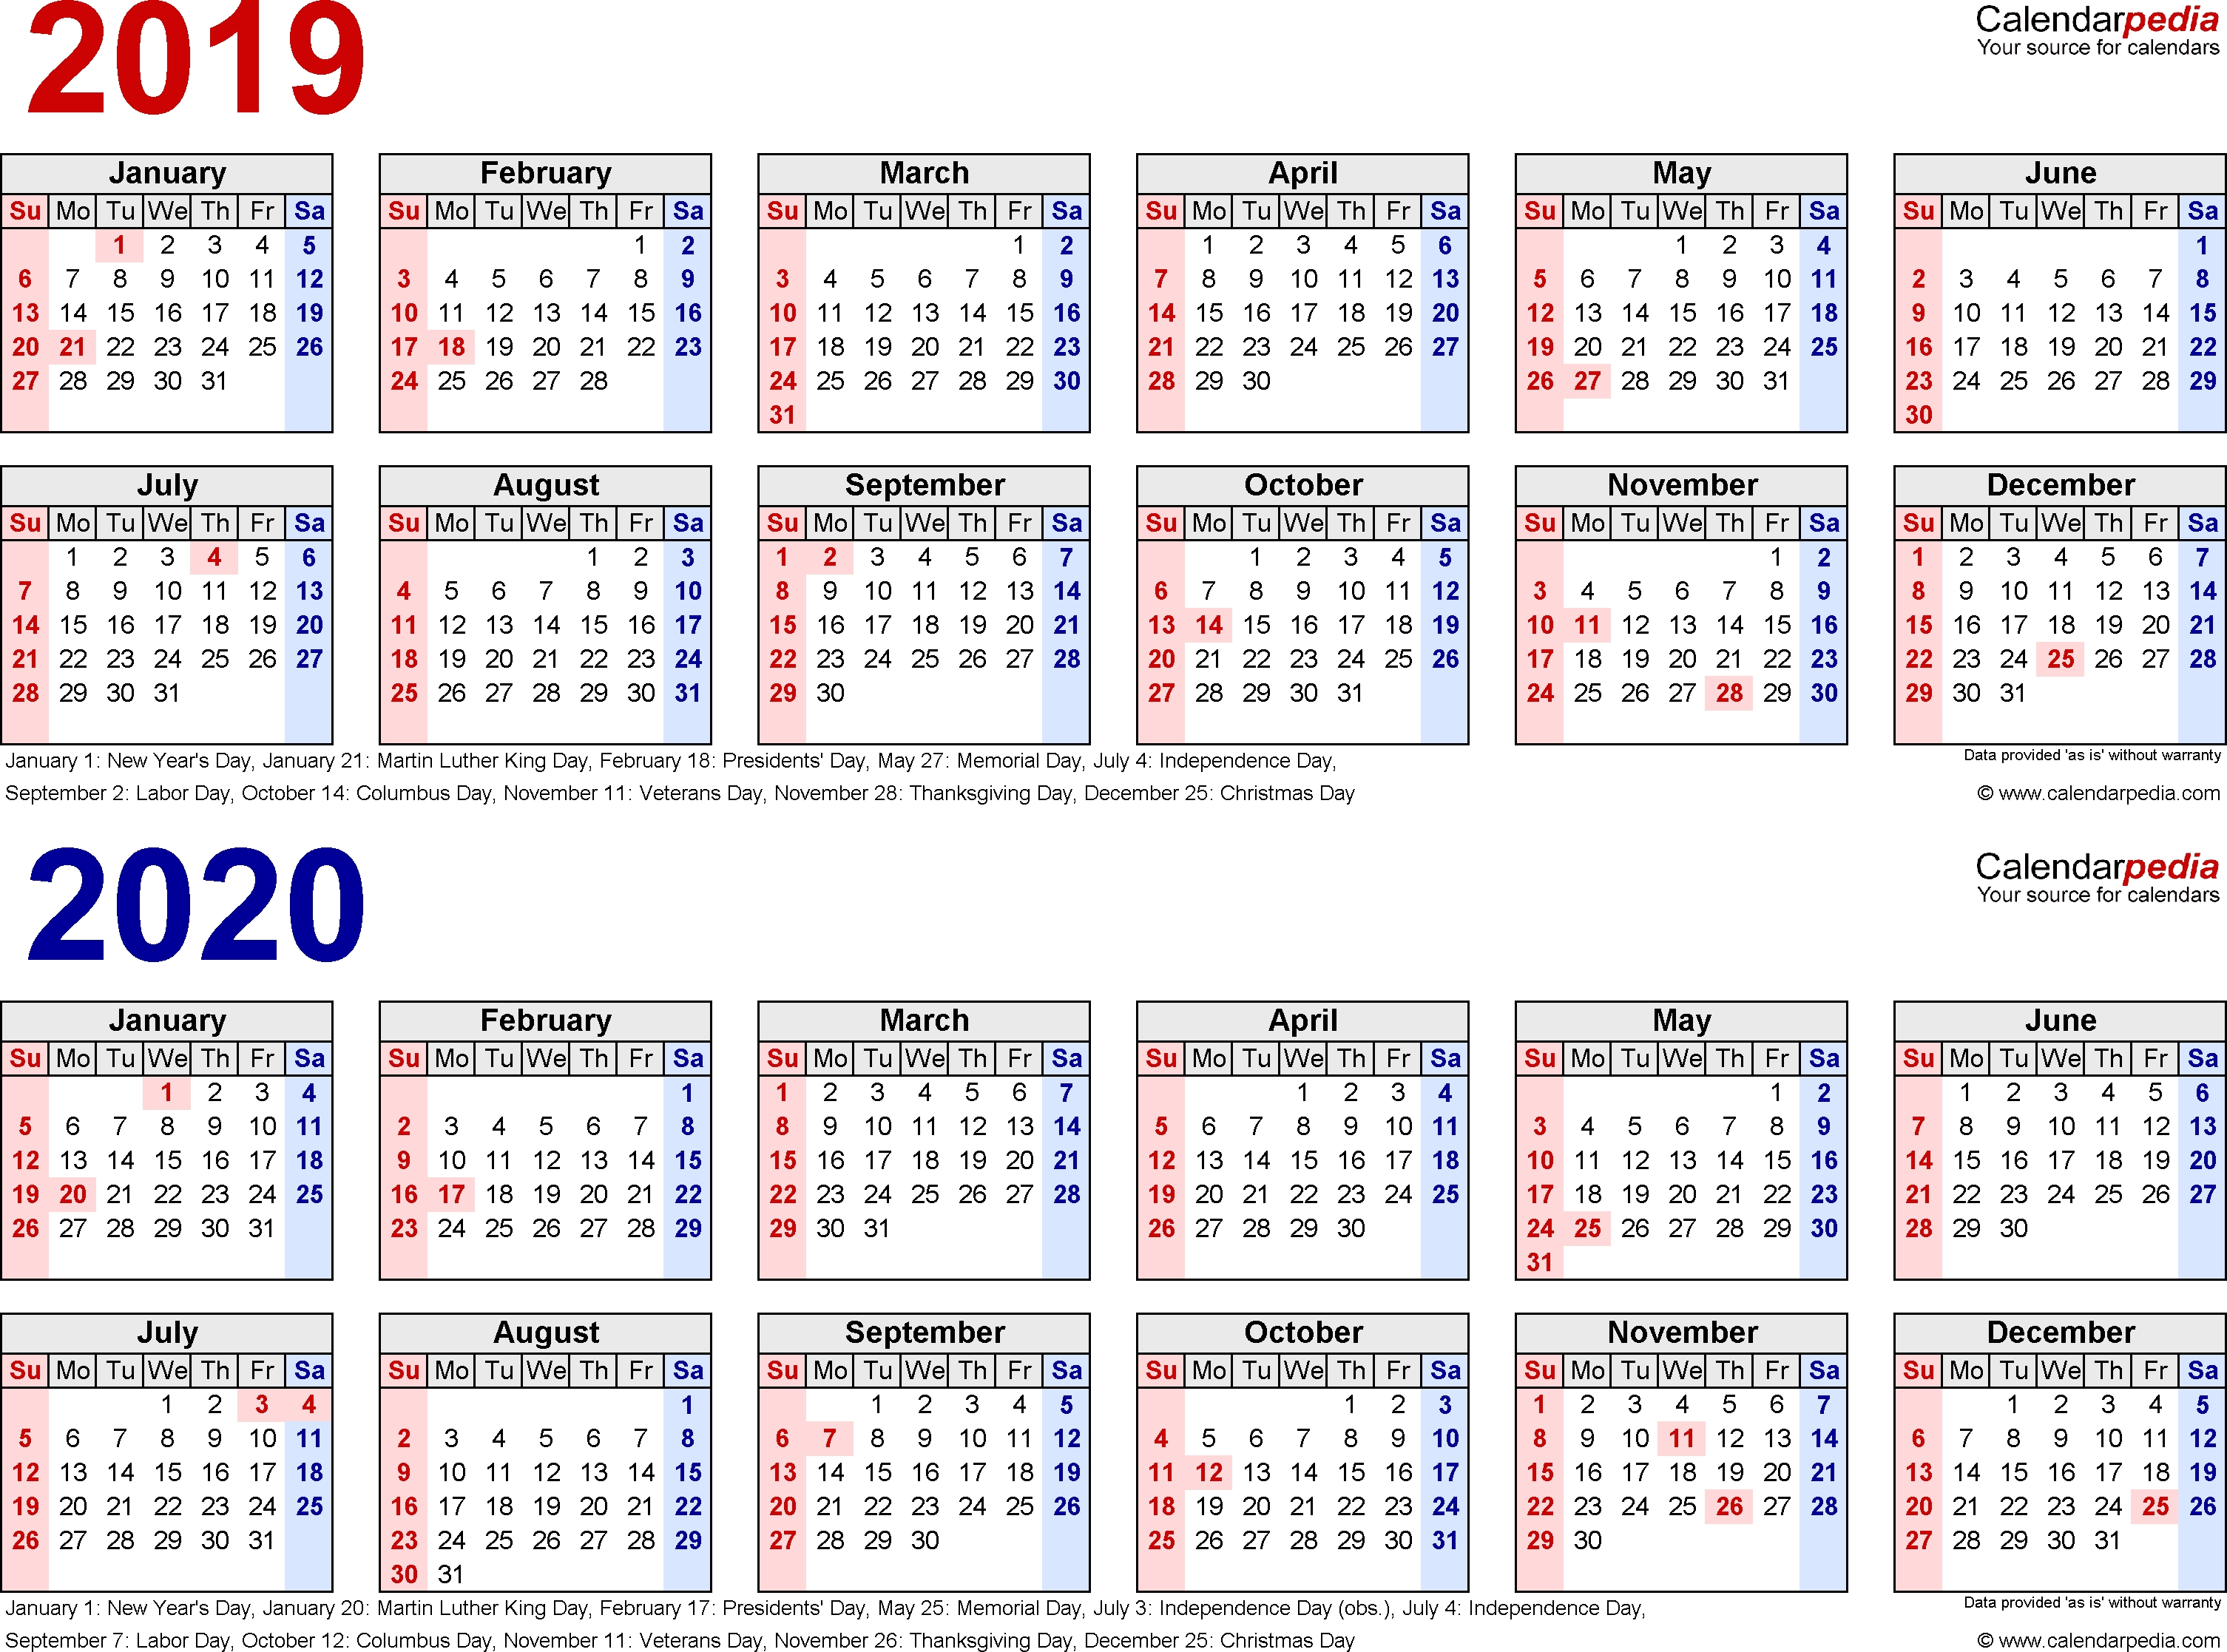 2019-2020 Calendar - Free Printable Two-Year Word Calendars for Fillable 2019-2020 Calendar